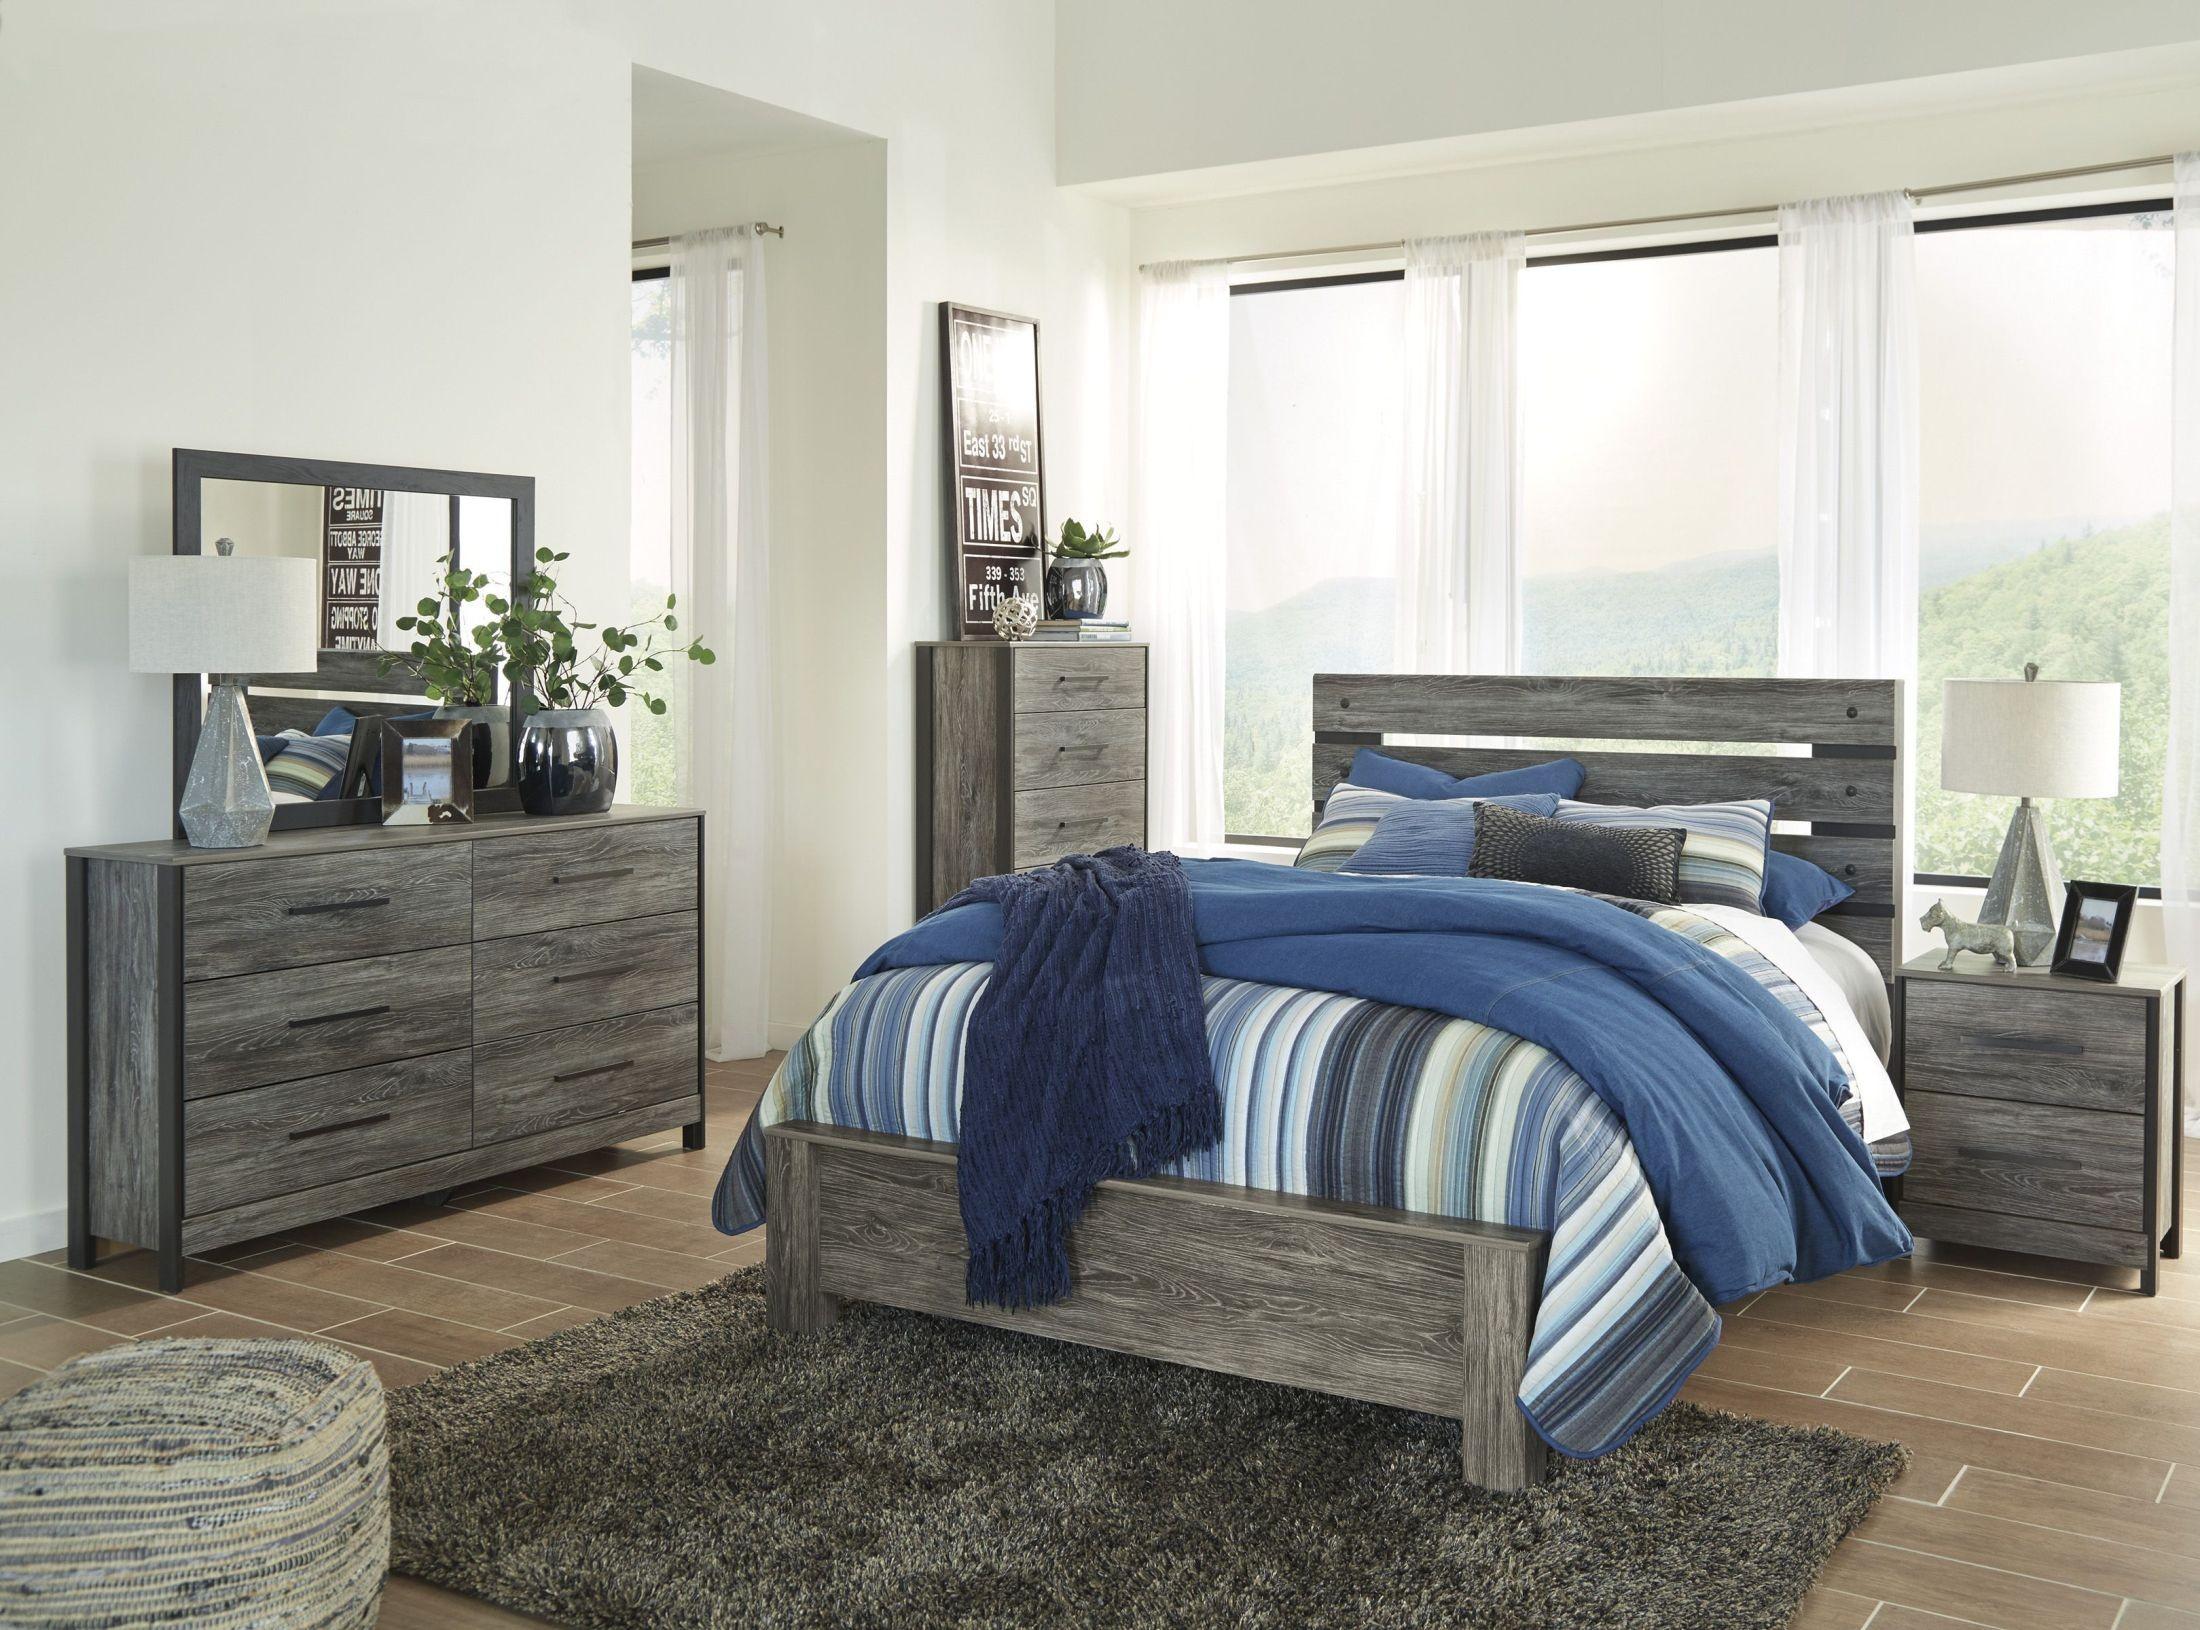 Cazenfeld black and gray panel bedroom set b227 54 57 96 - Black and grey bedroom furniture ...